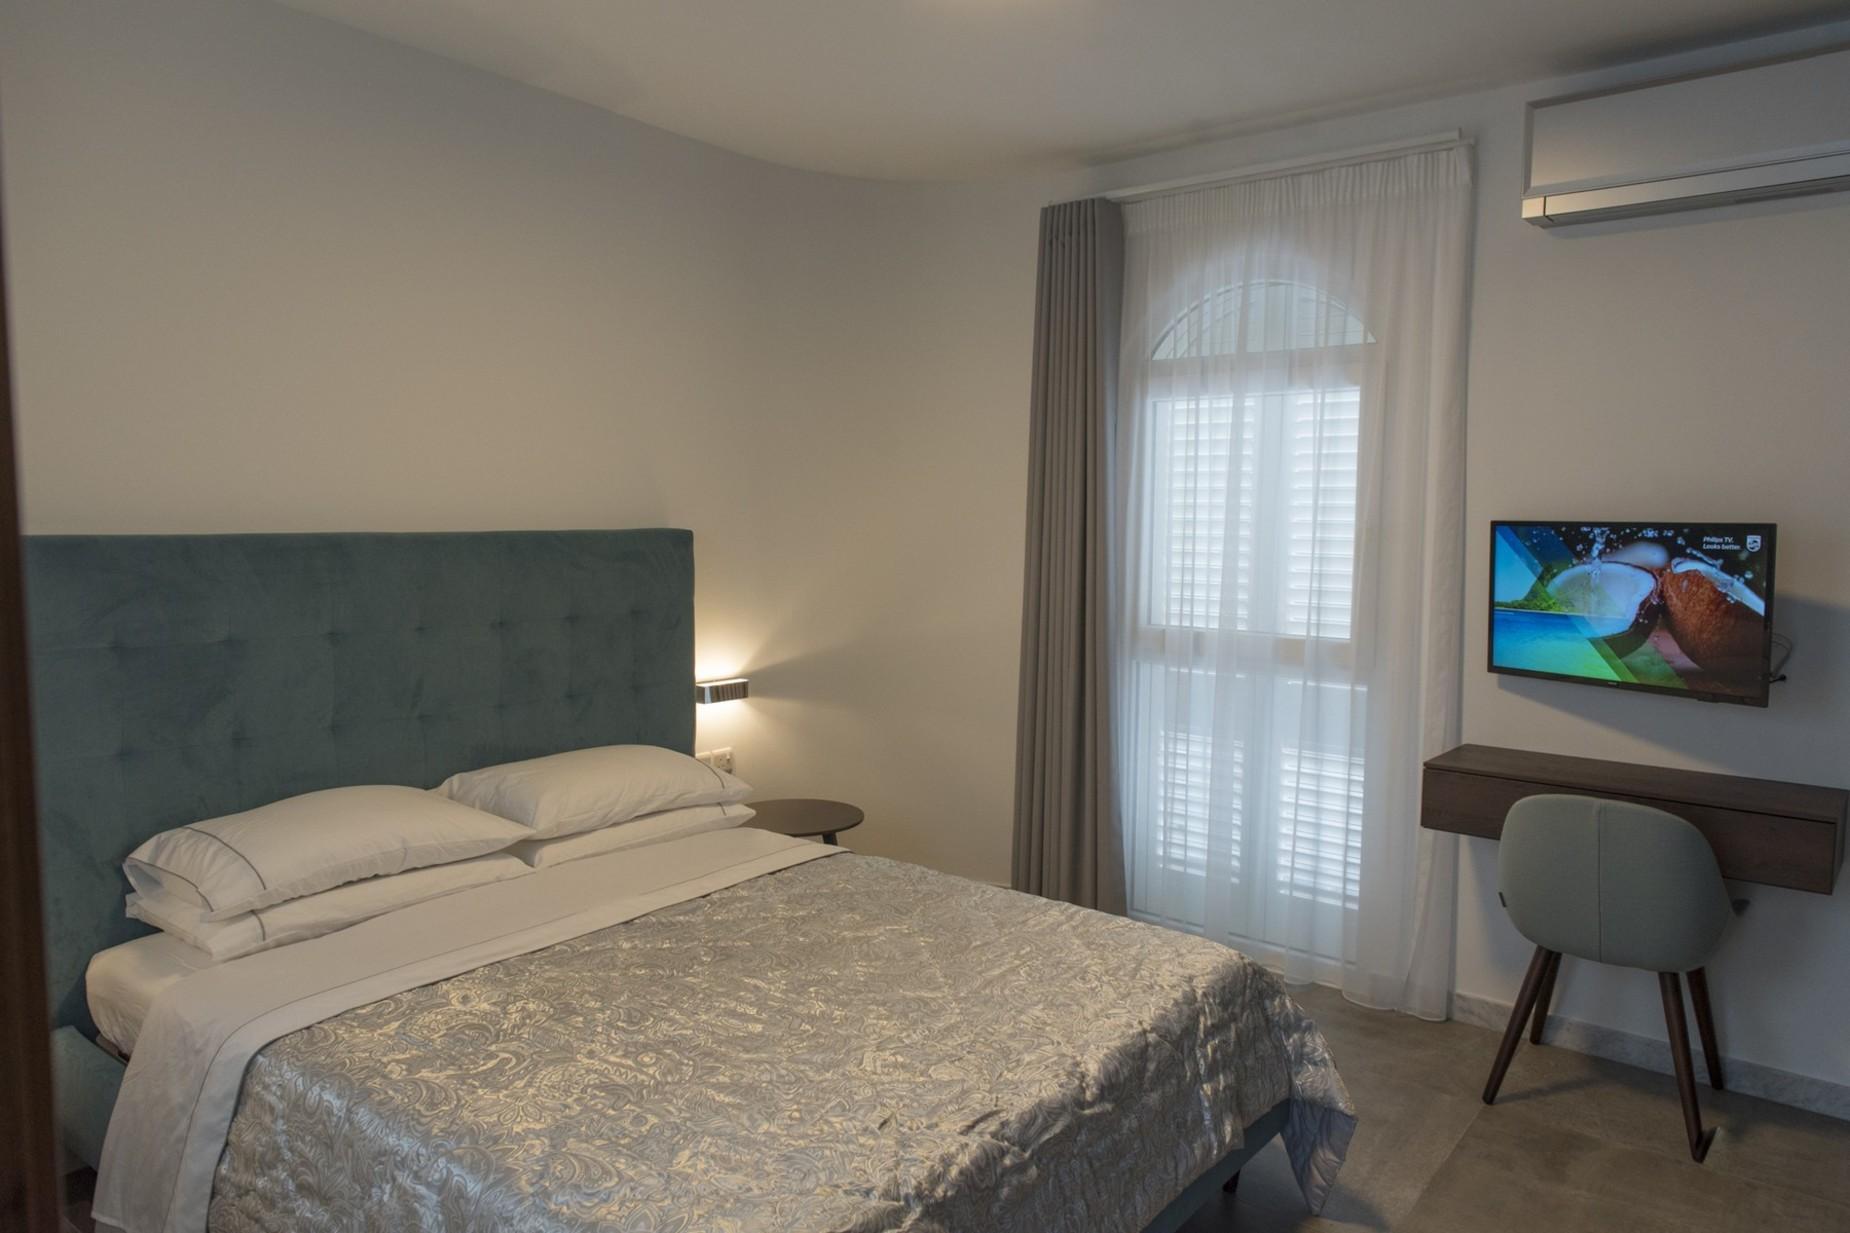 3 bed Villa For Rent in Ibragg, Ibragg - thumb 7